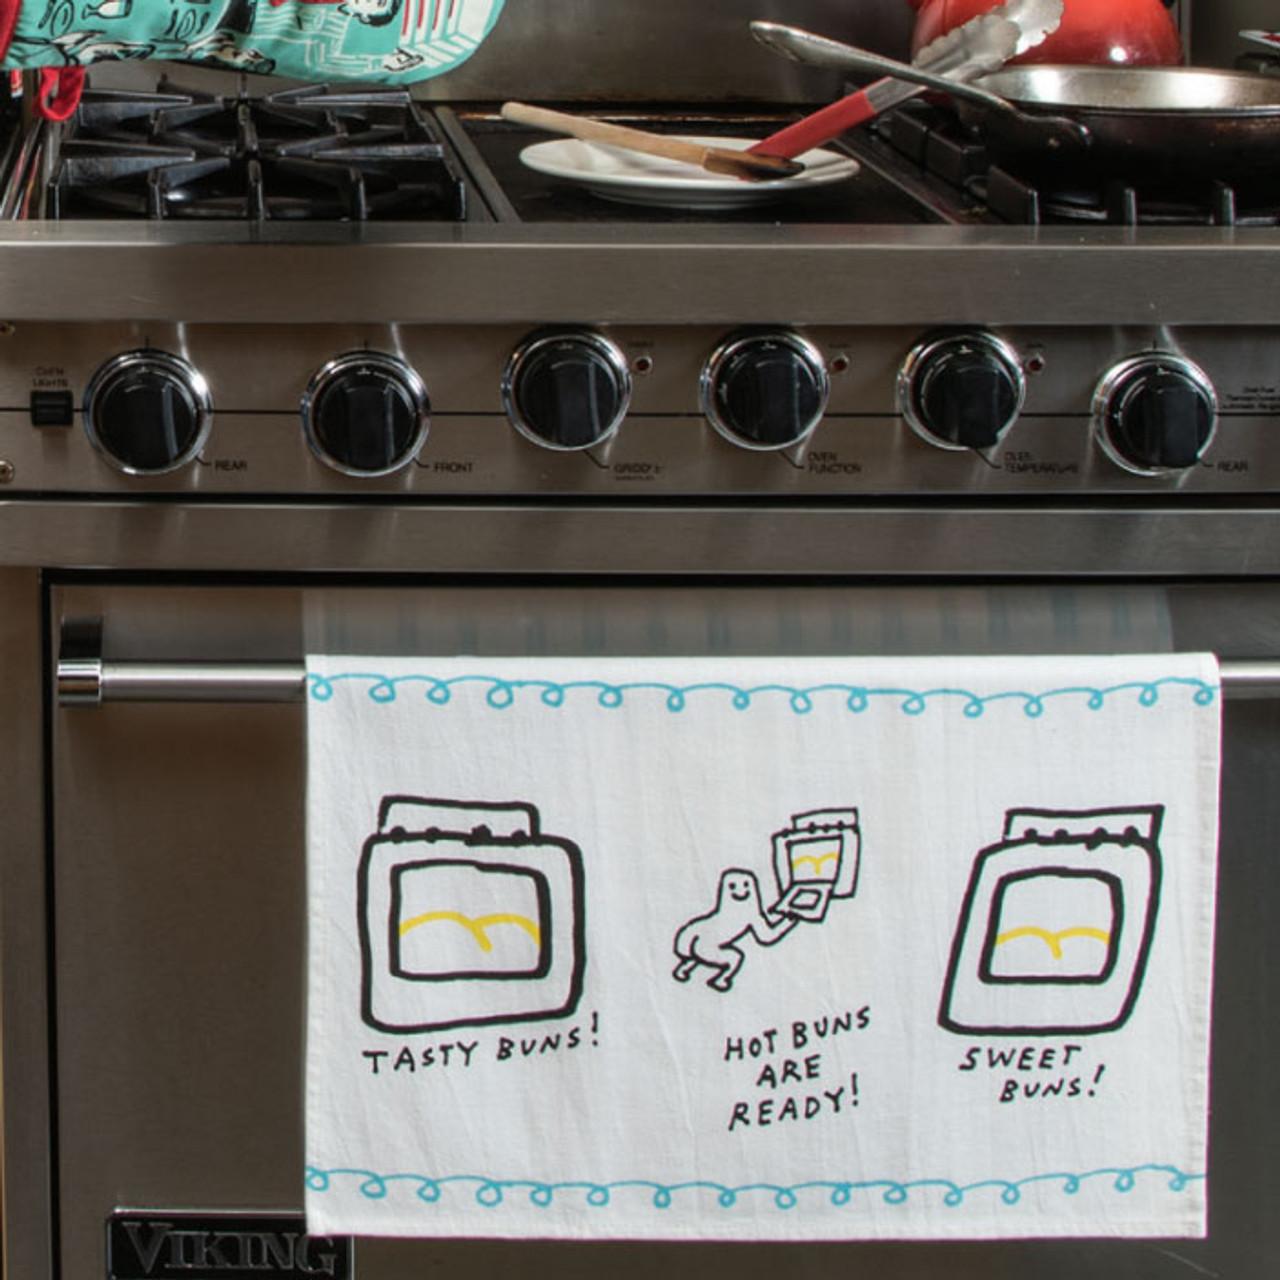 Hot Buns, Tasty Buns, Sweet Buns Are Ready Dish Towel